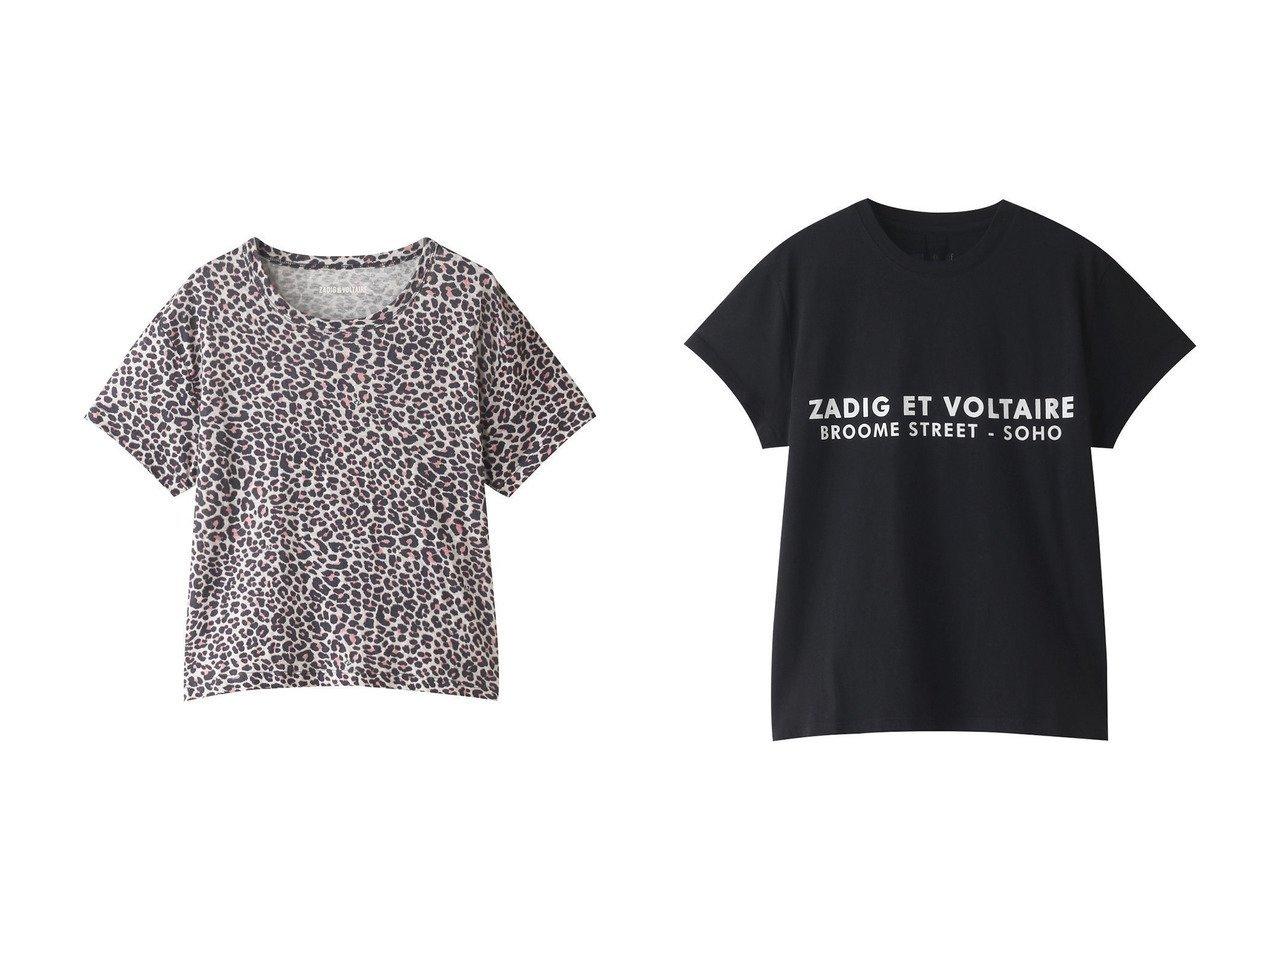 【ZADIG & VOLTAIRE/ザディグ エ ヴォルテール】のZOE ZV ADDRESS T-SHIRT ORGANIC COTON PRINT Tシャツ&MARTA AO LEOPARD DEBARDEUR LIN PRINT ALL OVER Tシャツ 【トップス・カットソー】おすすめ!人気、トレンド・レディースファッションの通販  おすすめで人気の流行・トレンド、ファッションの通販商品 メンズファッション・キッズファッション・インテリア・家具・レディースファッション・服の通販 founy(ファニー) https://founy.com/ ファッション Fashion レディースファッション WOMEN トップス・カットソー Tops/Tshirt シャツ/ブラウス Shirts/Blouses ロング / Tシャツ T-Shirts カットソー Cut and Sewn ワンピース Dress ドレス Party Dresses 2021年 2021 2021春夏・S/S SS/Spring/Summer/2021 S/S・春夏 SS・Spring/Summer コンパクト ショート スリーブ リネン レオパード 春 Spring |ID:crp329100000028308